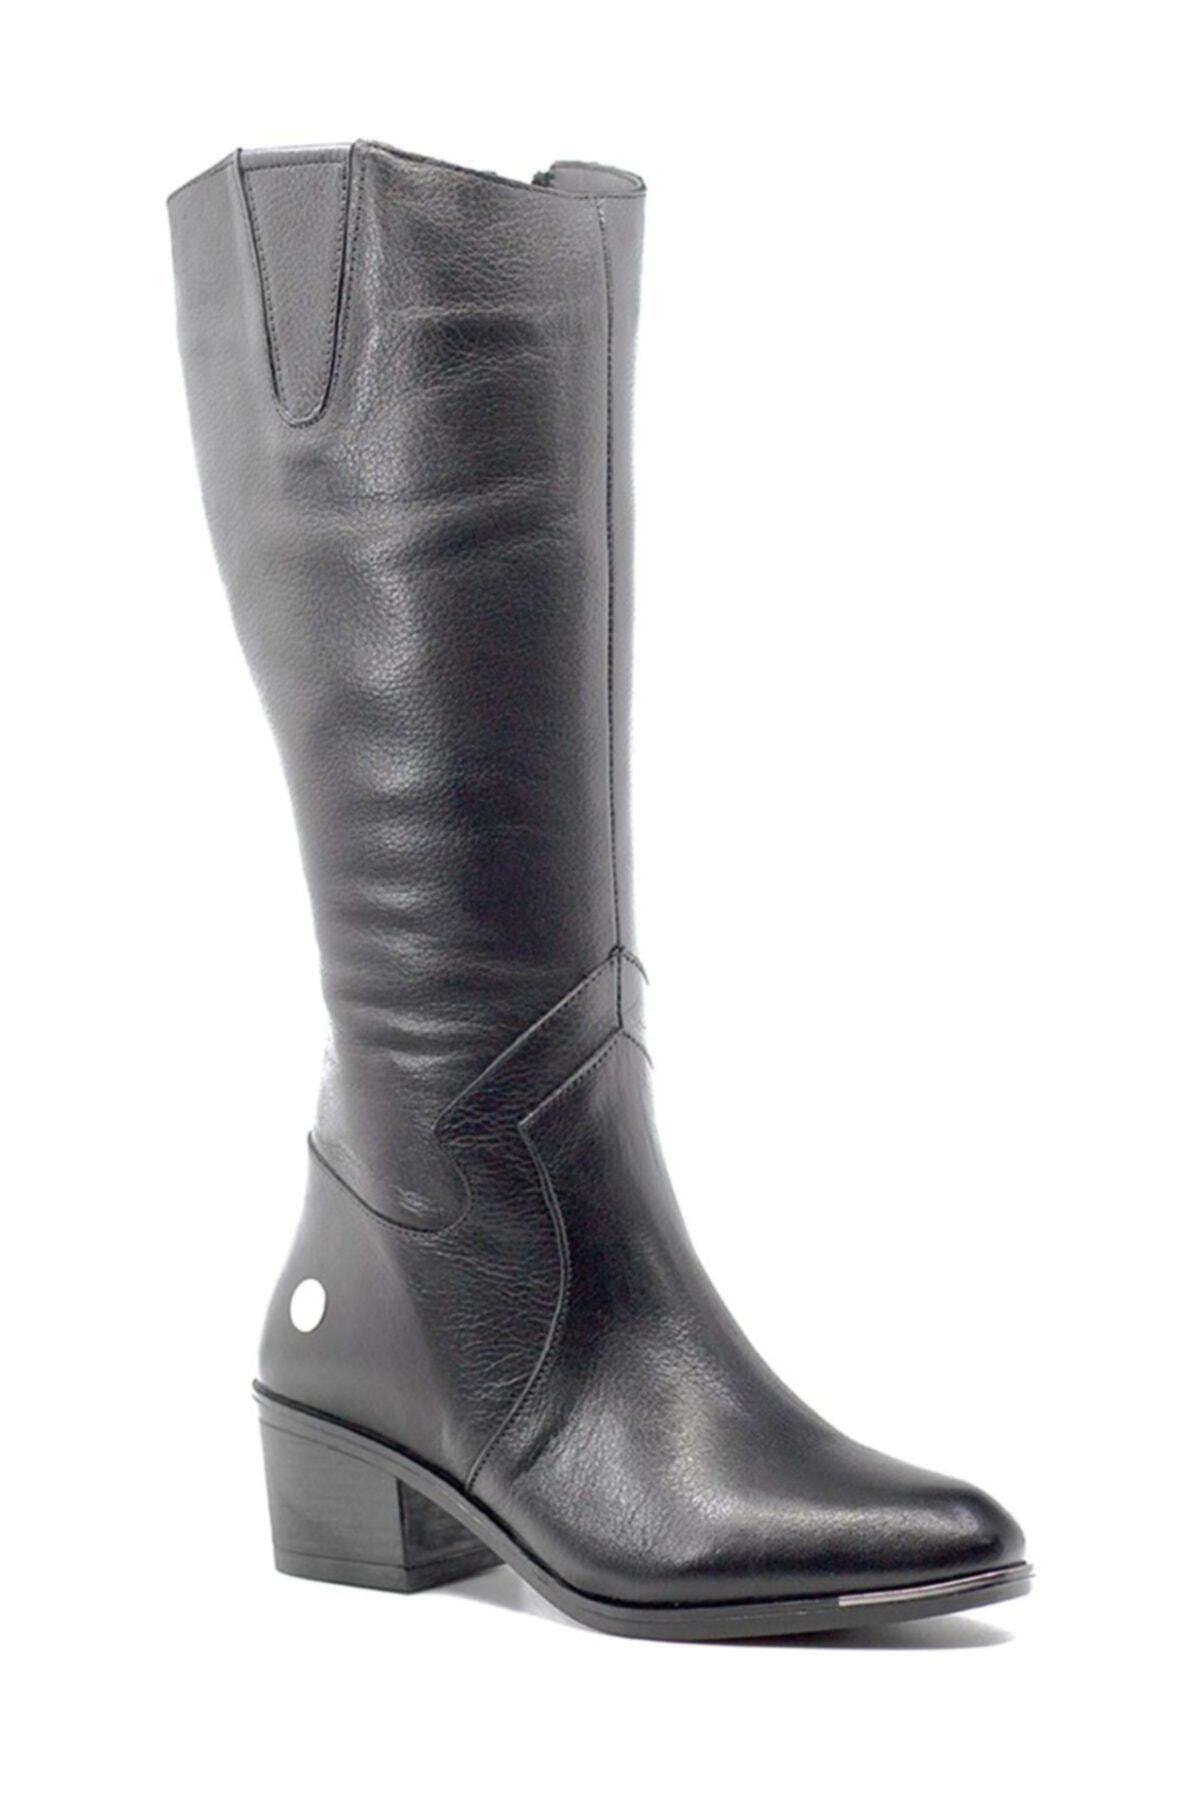 Mammamia D19kc-2020 Hakiki Deri Siyah Kadın Çizme 1